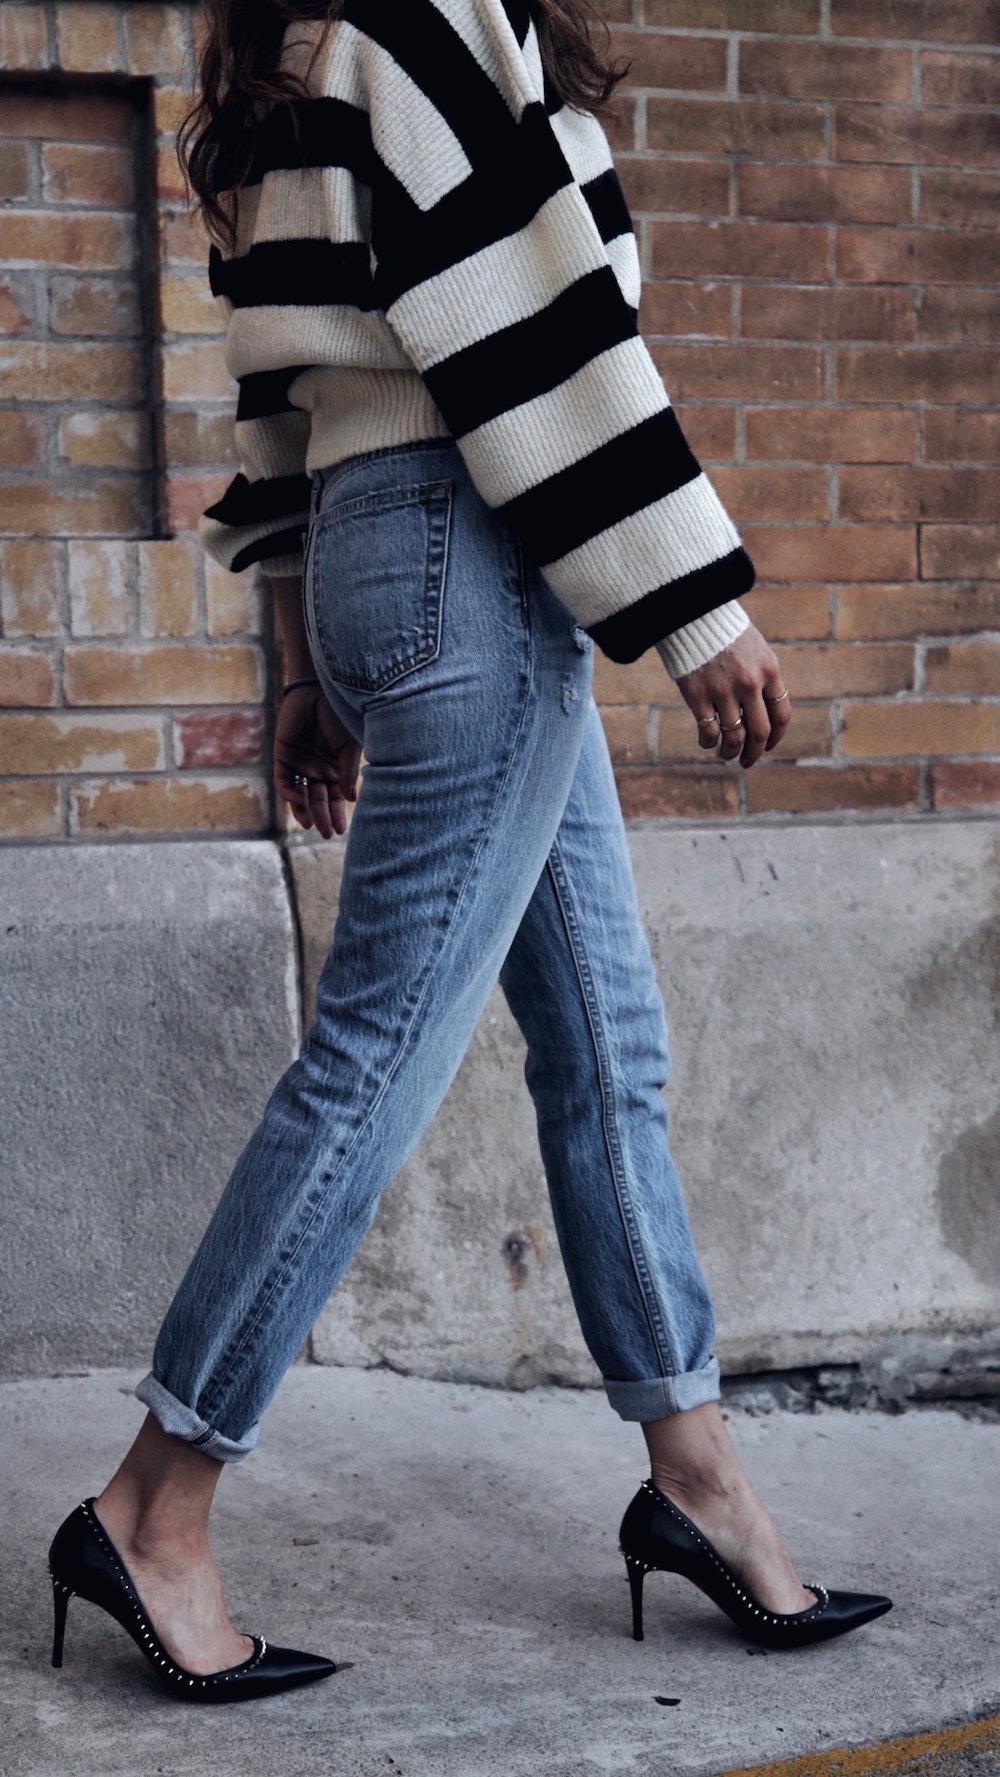 follow me on IG @_nathaliemartin - REVOLVE striped sweater, GRLFRND Karoline jeans, Christian Louboutin Anjalina shoes - woahstyle.com 5.JPG